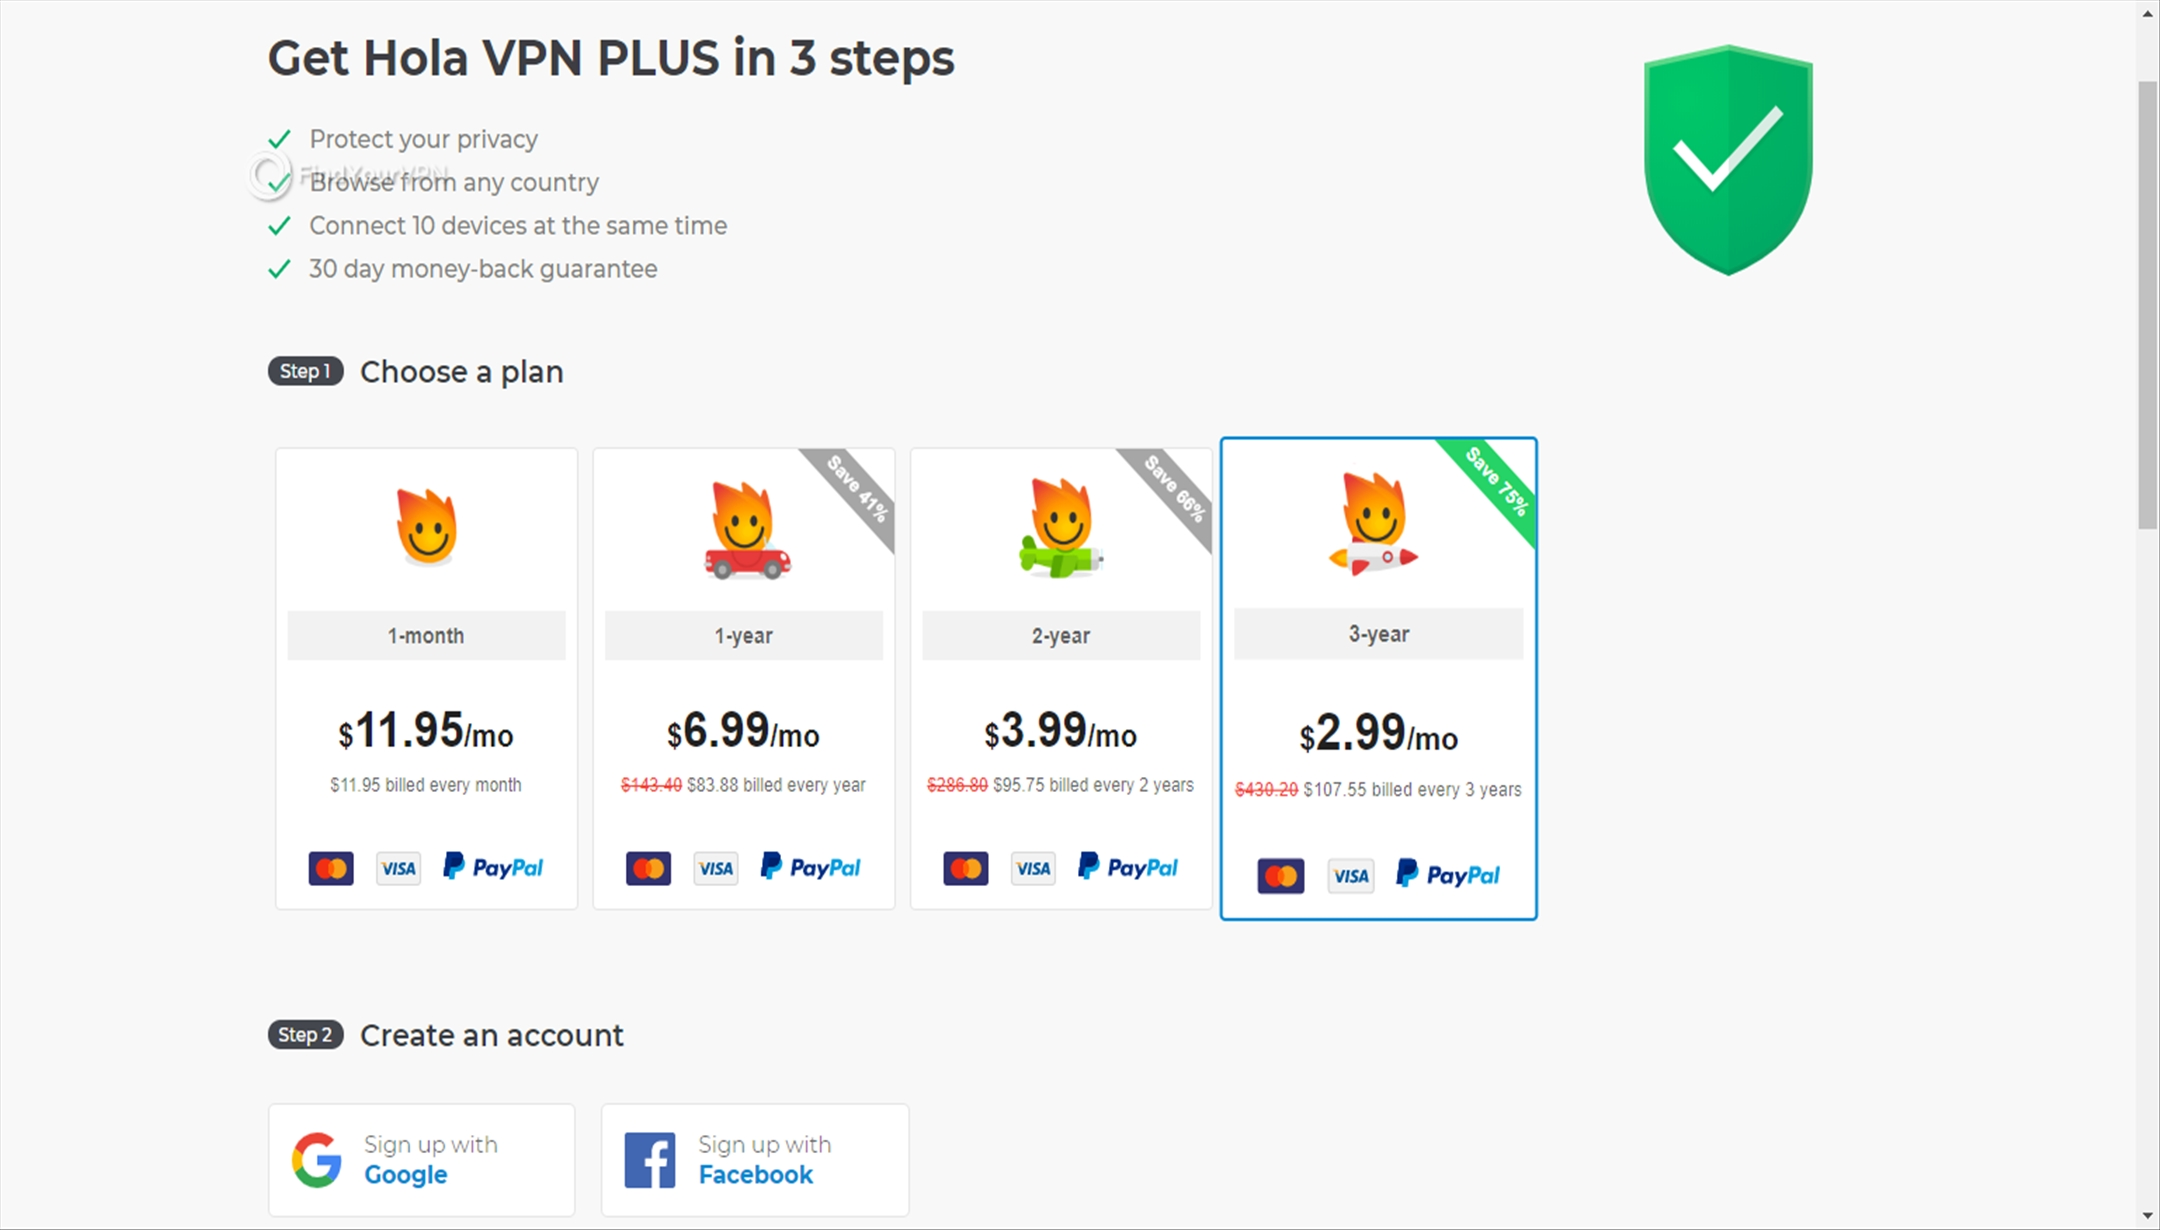 Choosing a subscription plan for Hola VPN